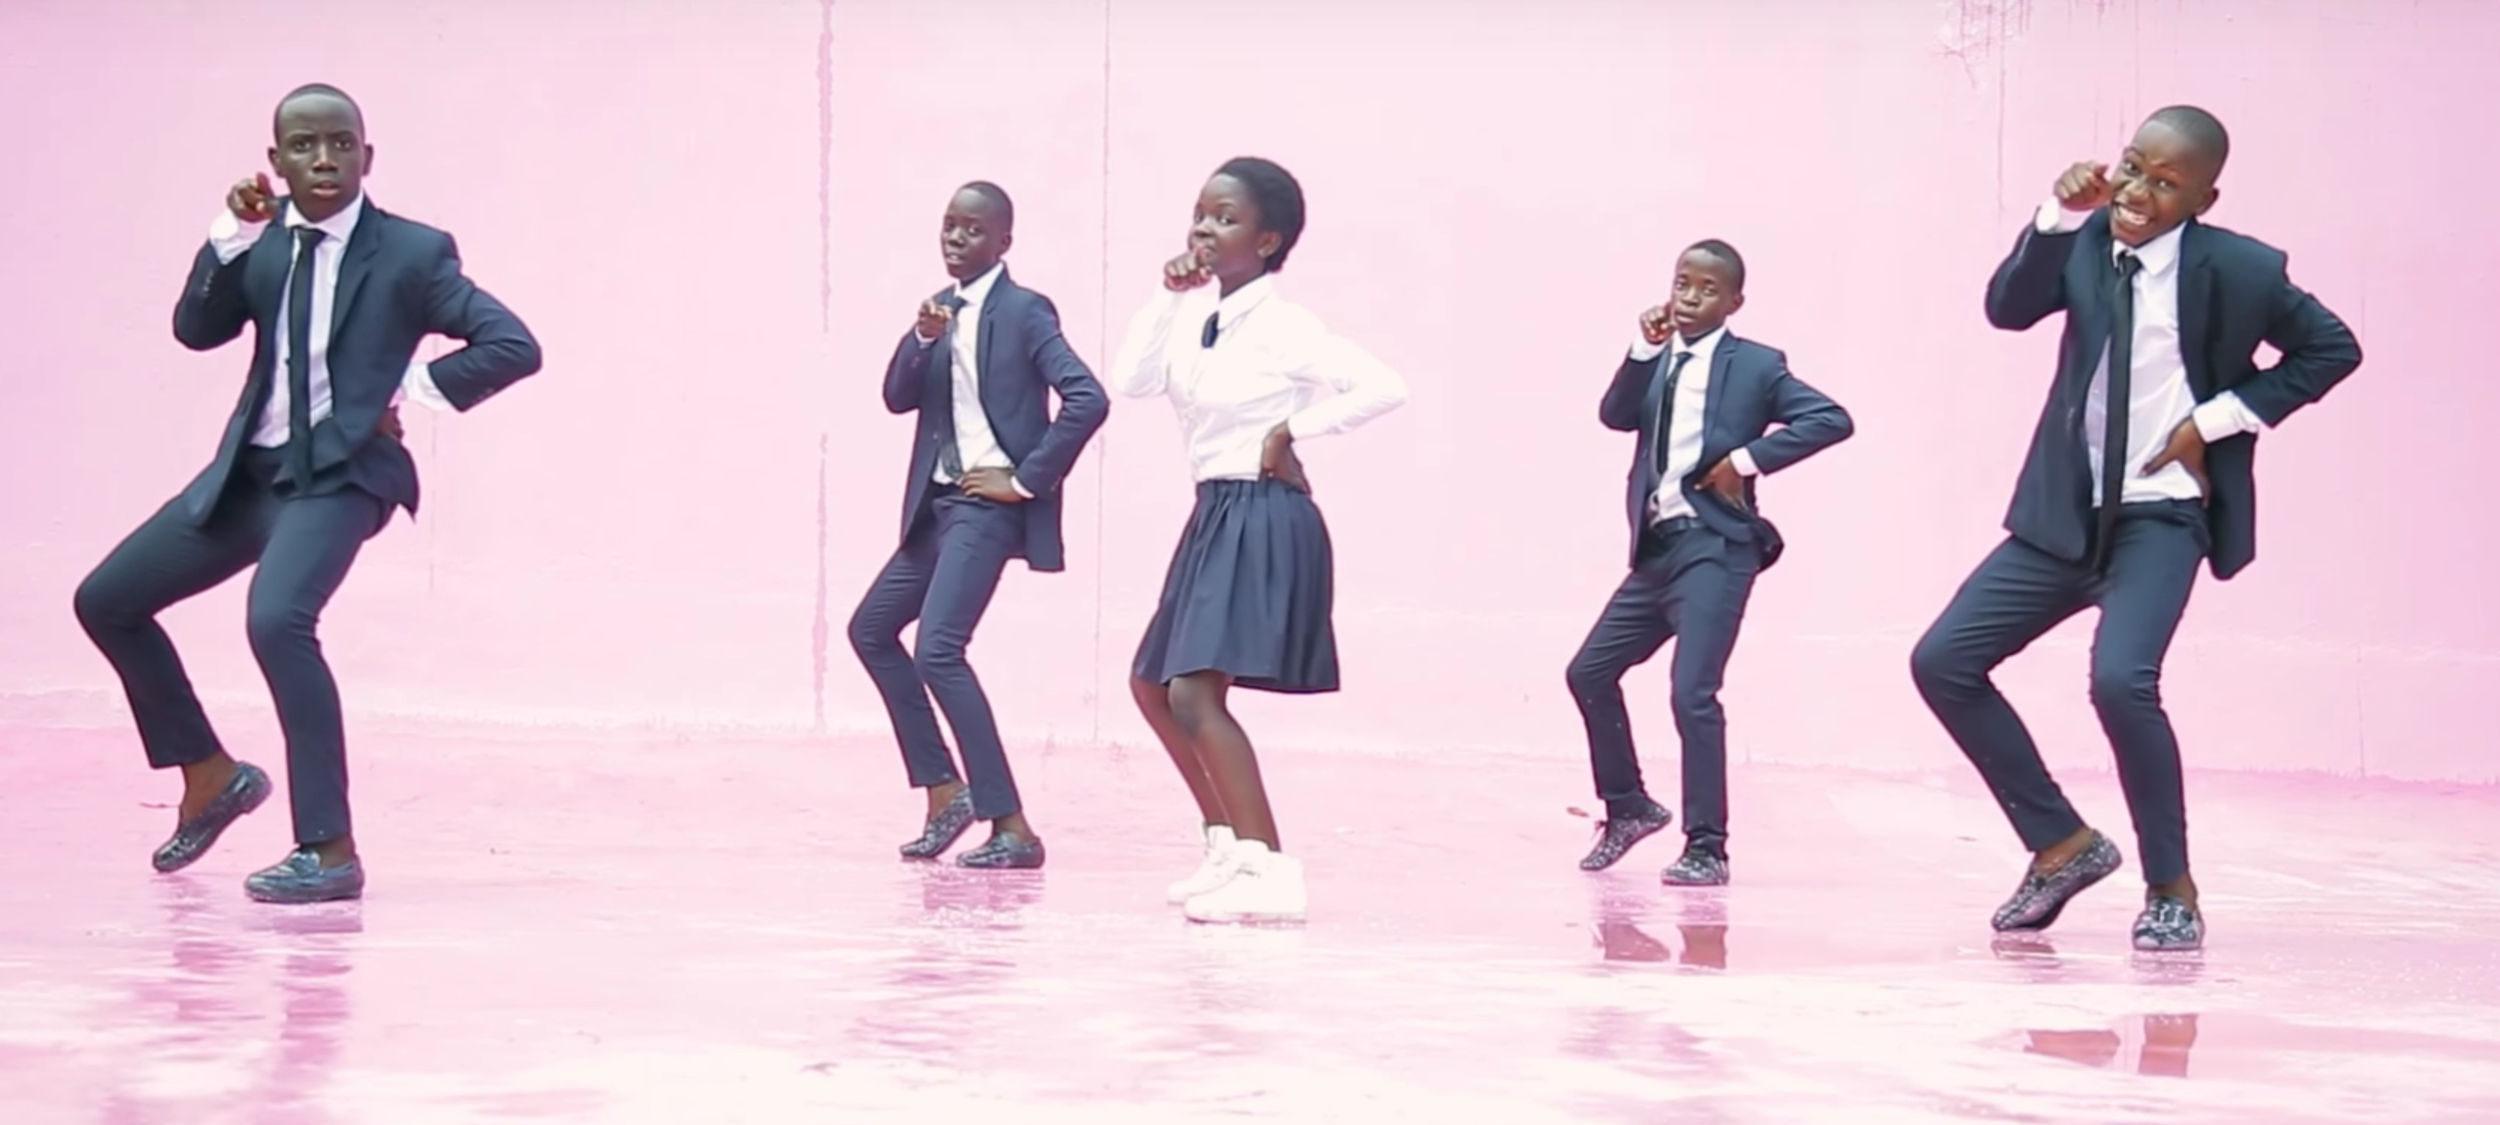 The 16 Best Viral Dance Videos of 2016 - OkayAfrica